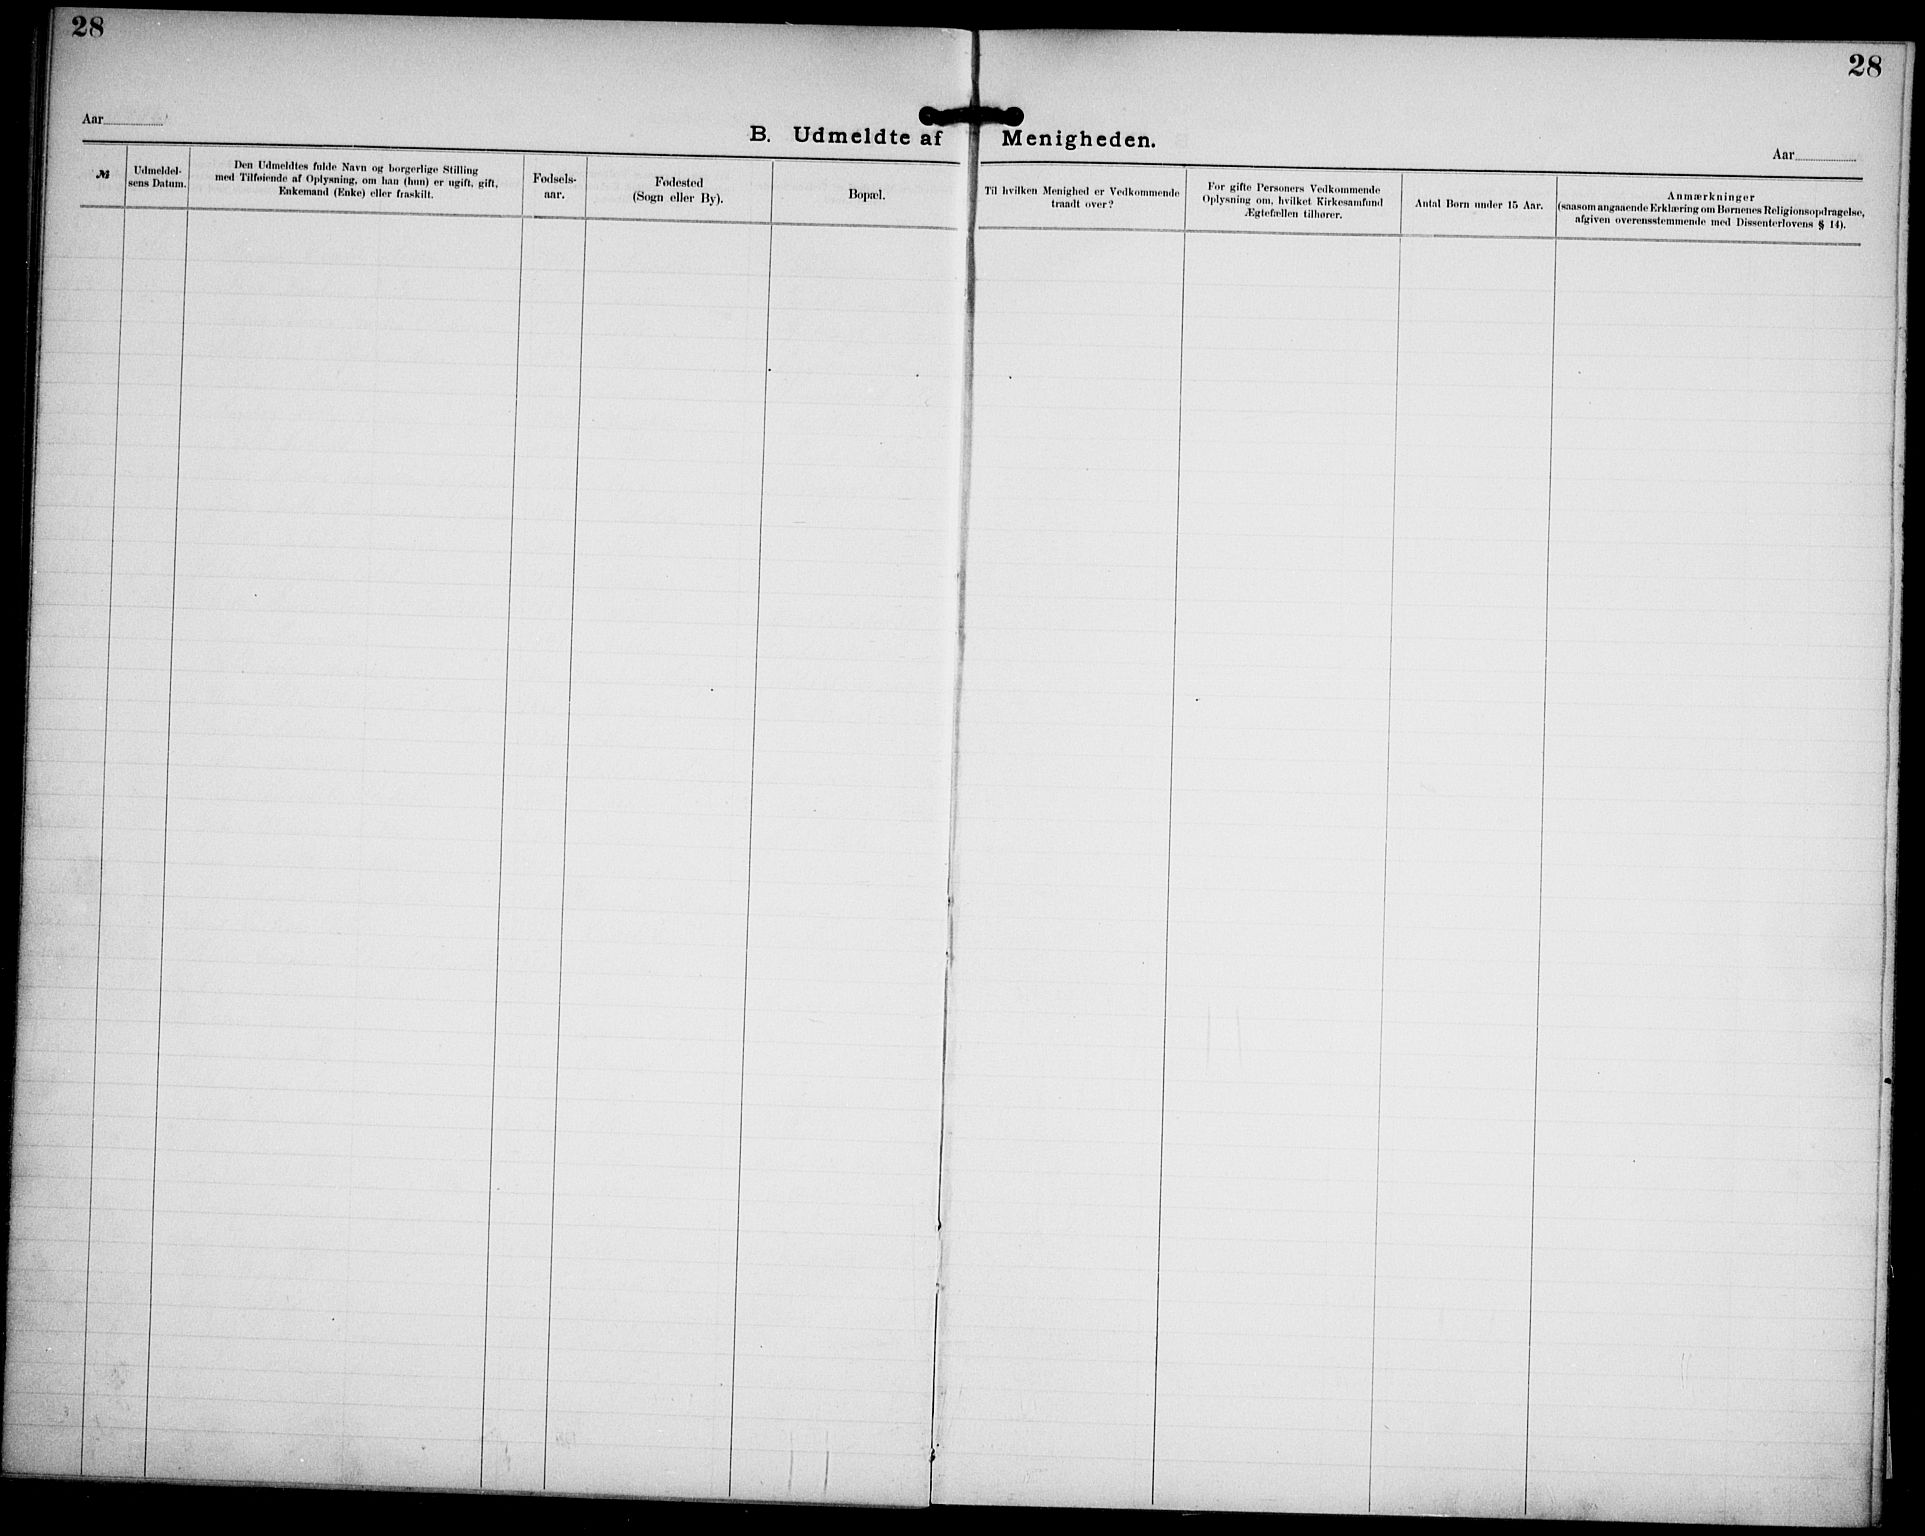 SAO, Kristi menighet Oslo , A/L0001: Dissenterprotokoll nr. 1, 1903-1938, s. 28